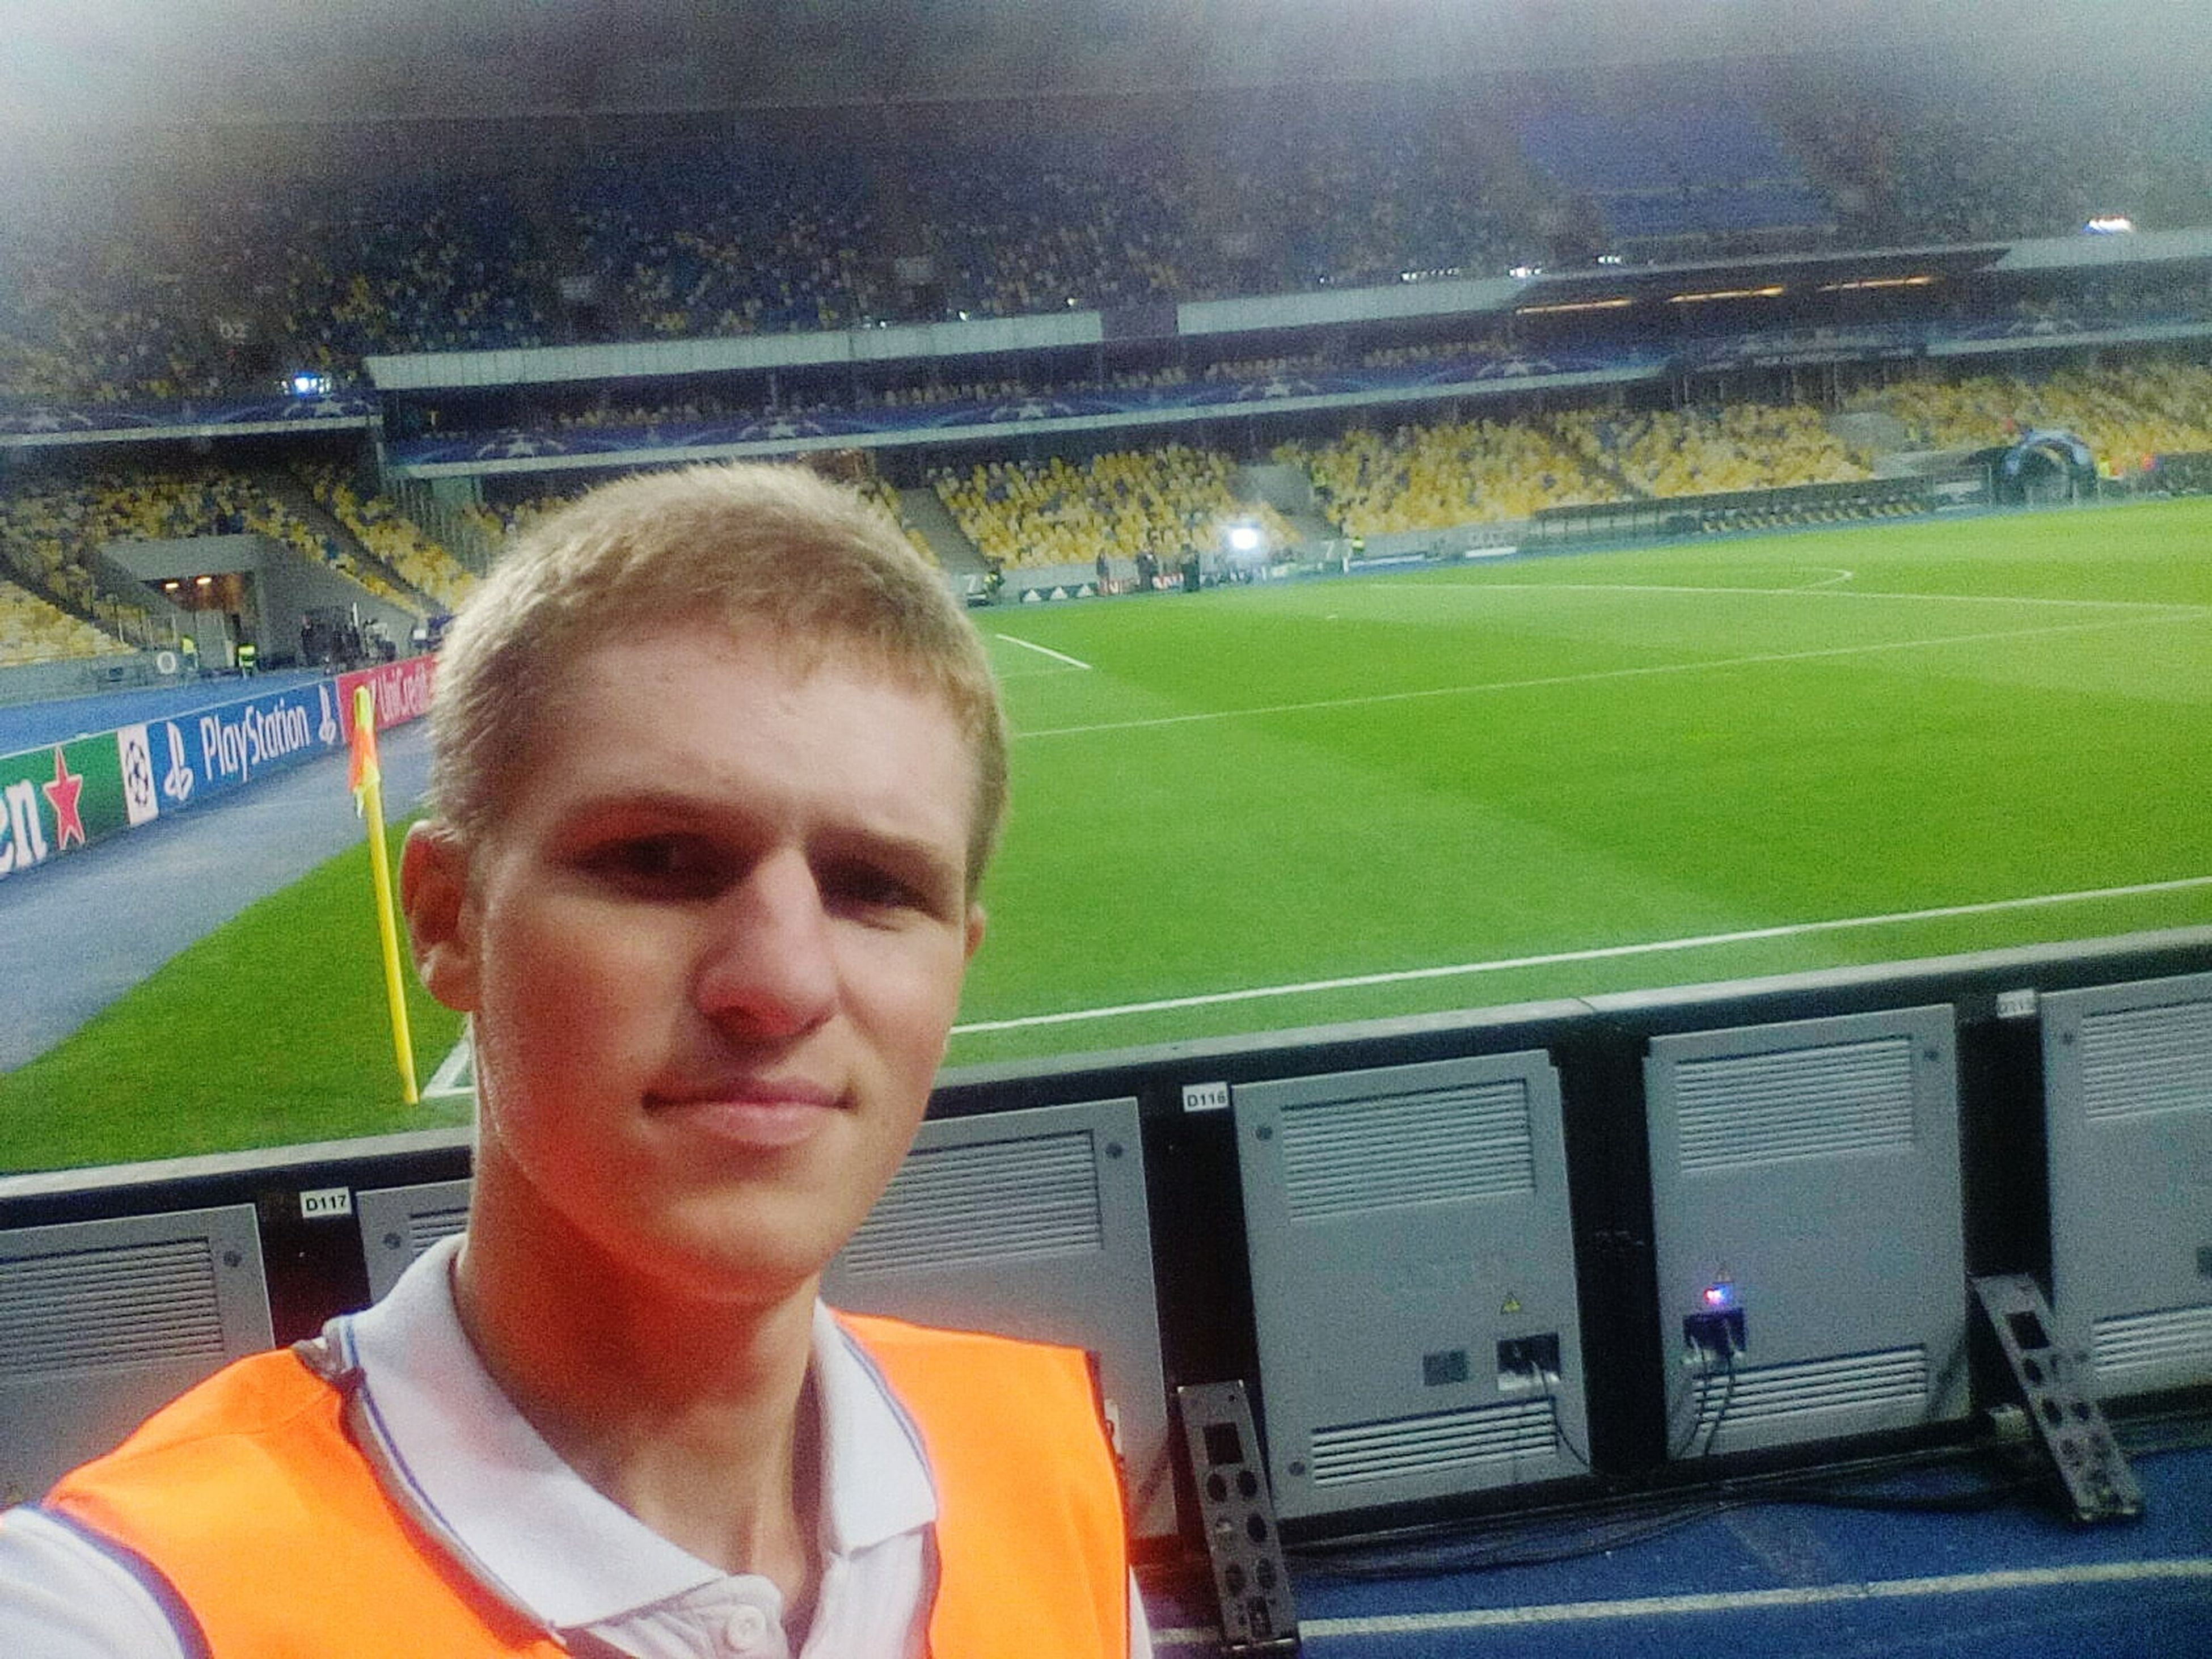 Stewarding  Nsk_olimpiyskiy Dynamo Napoli Match Football